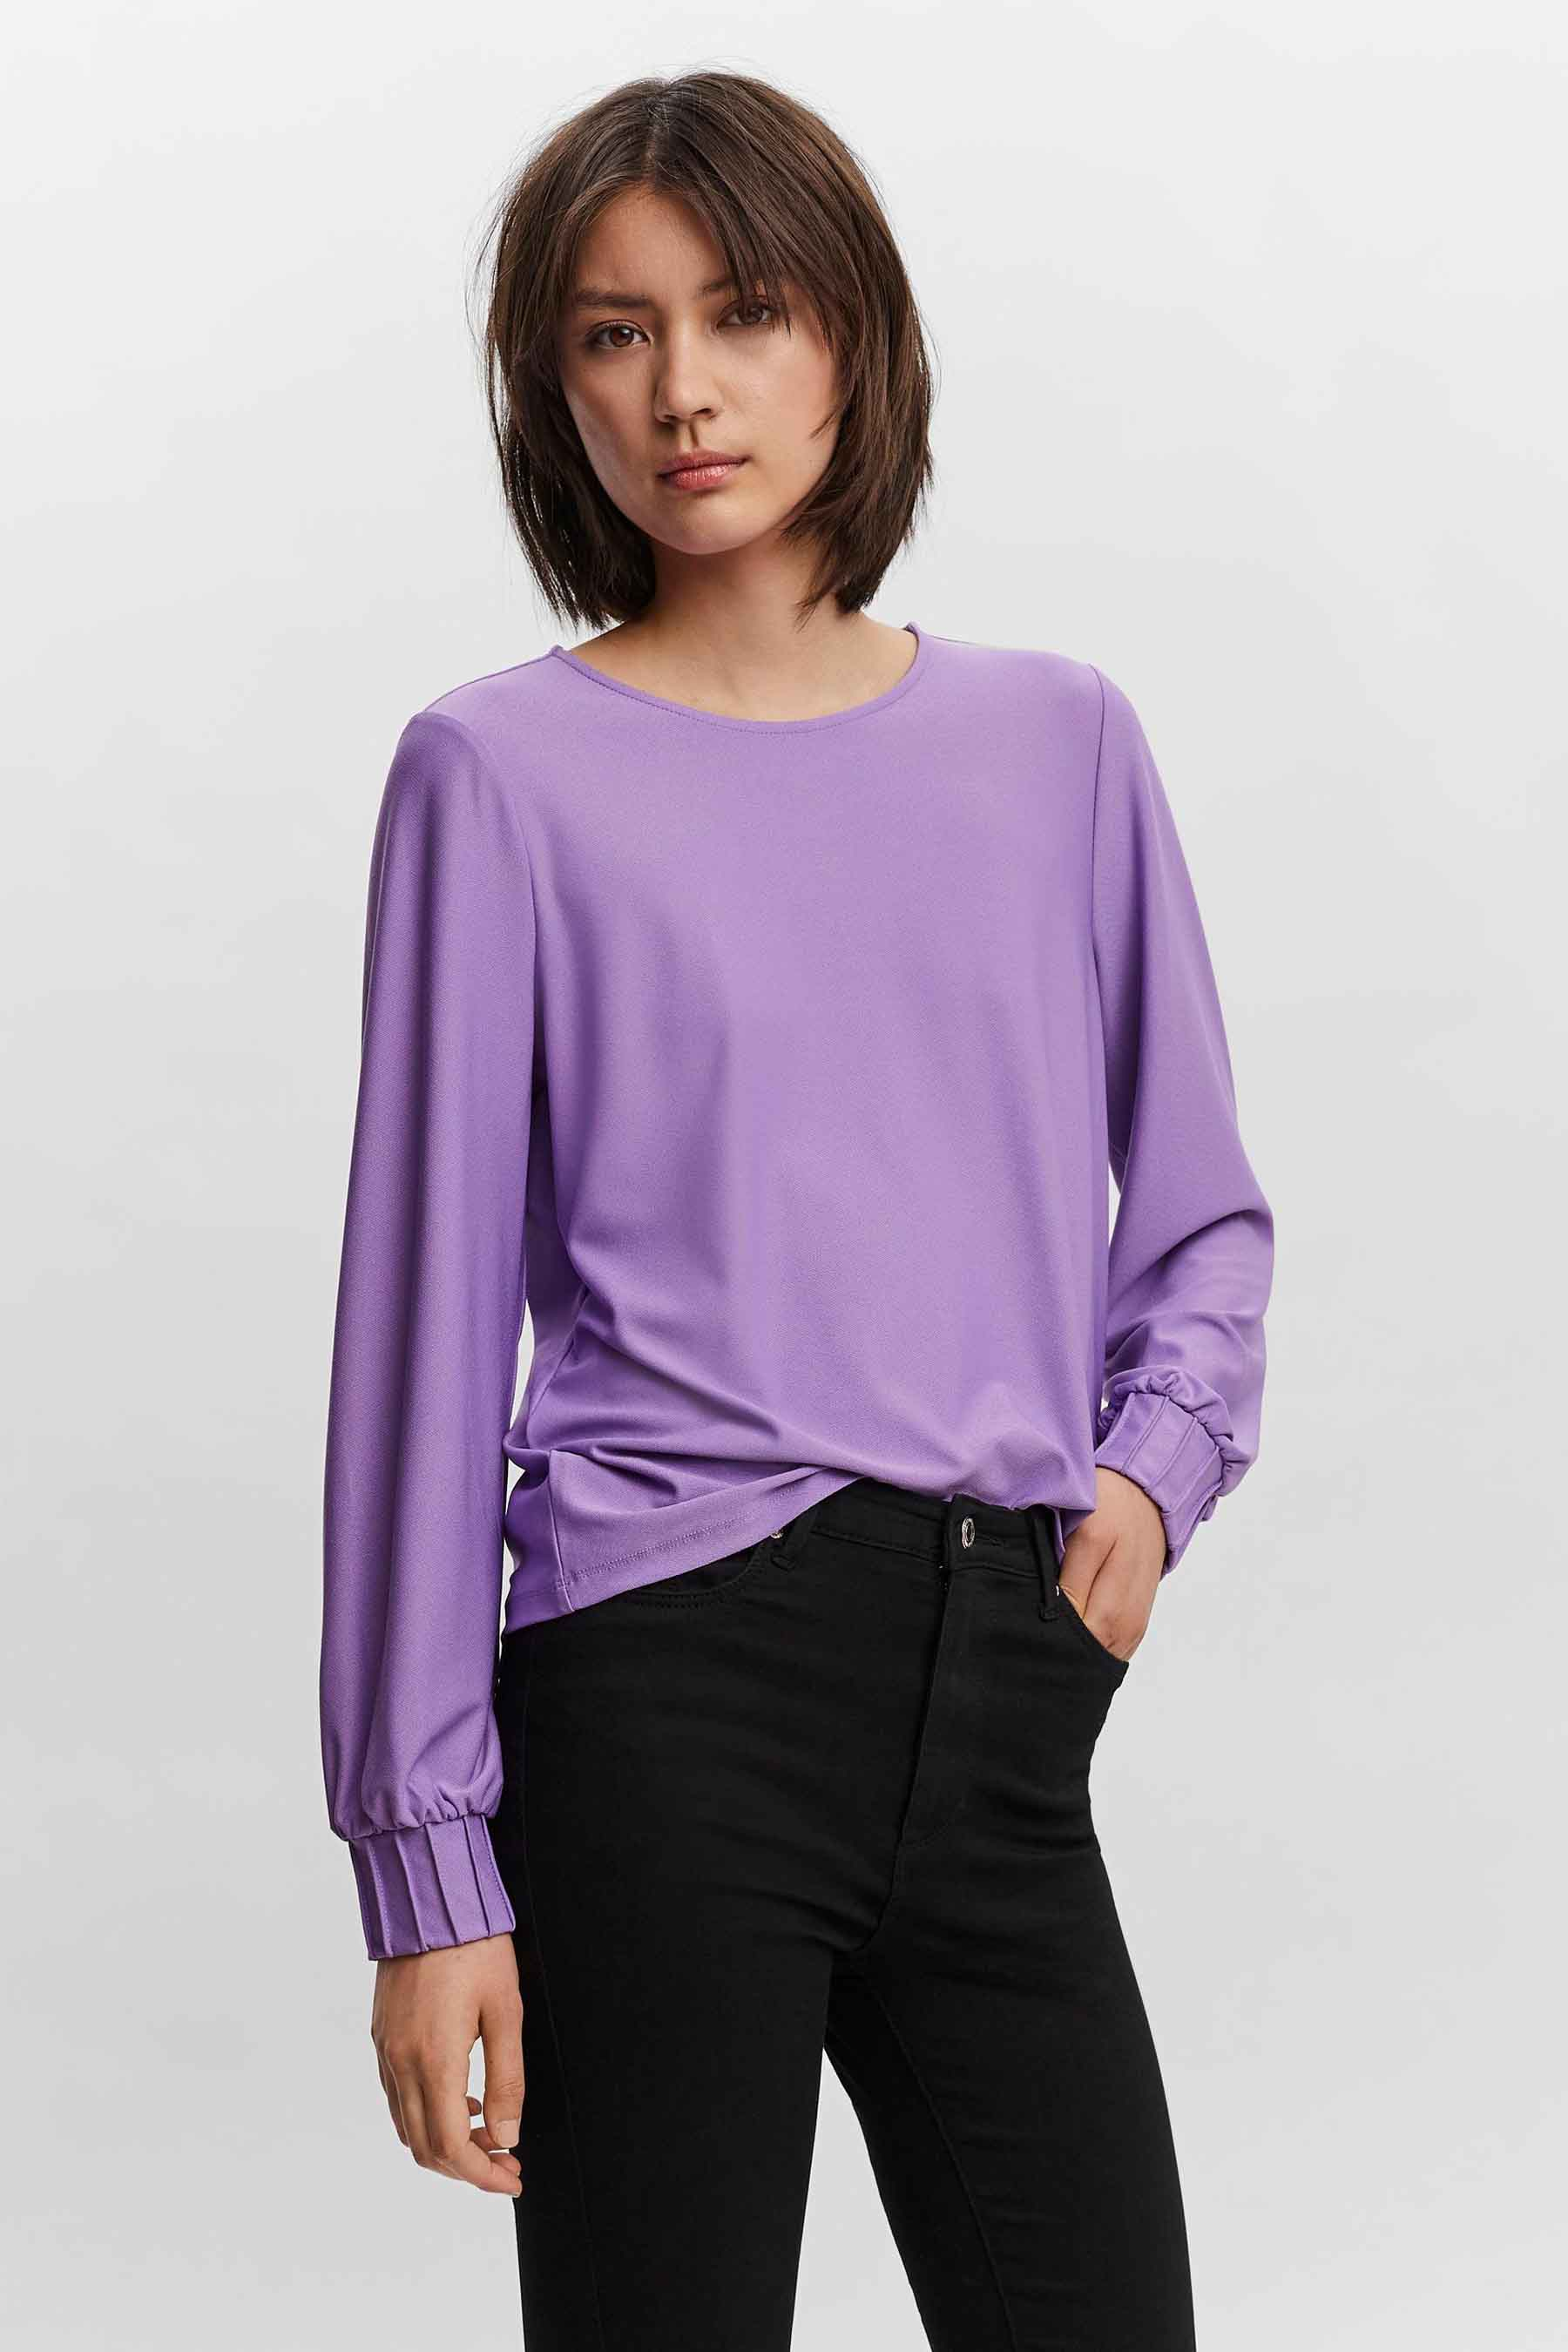 Vero Moda® Blouse lange mouwen, Paars, Dames, Maat: XS/S/M/L/XL